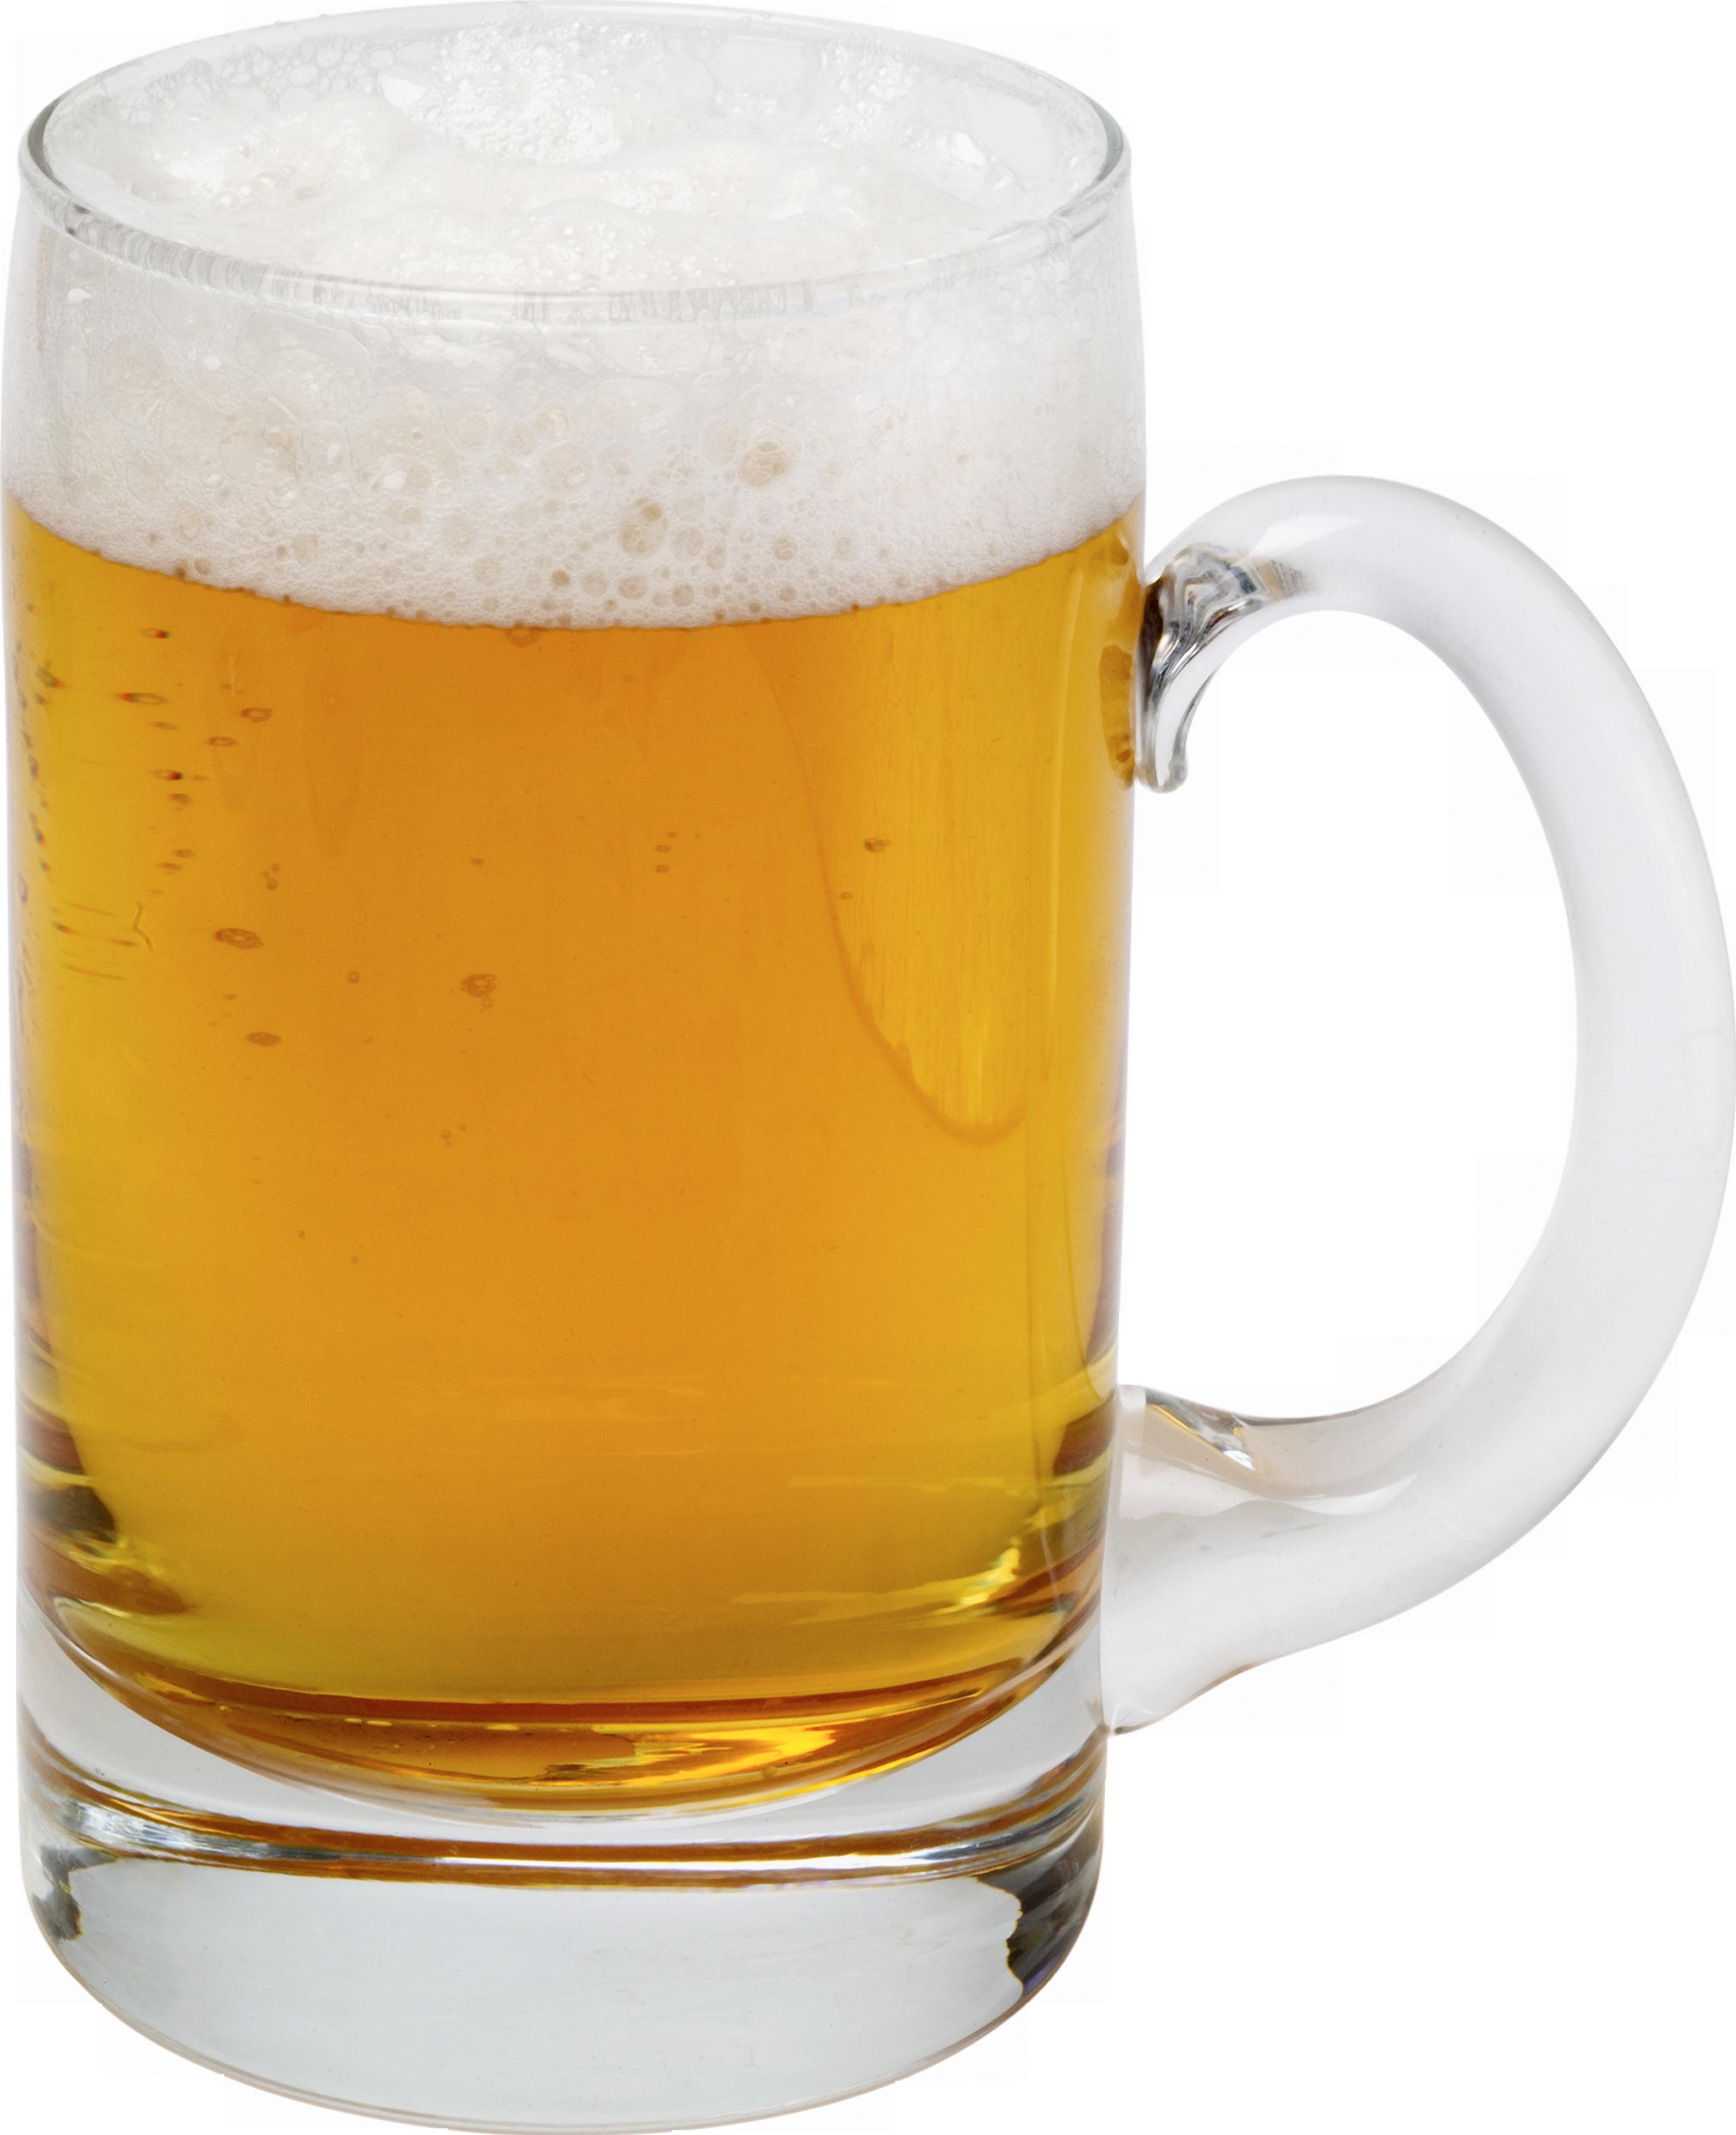 Pin By Charudeal On بطاقة Beer Mugs Beer Mug